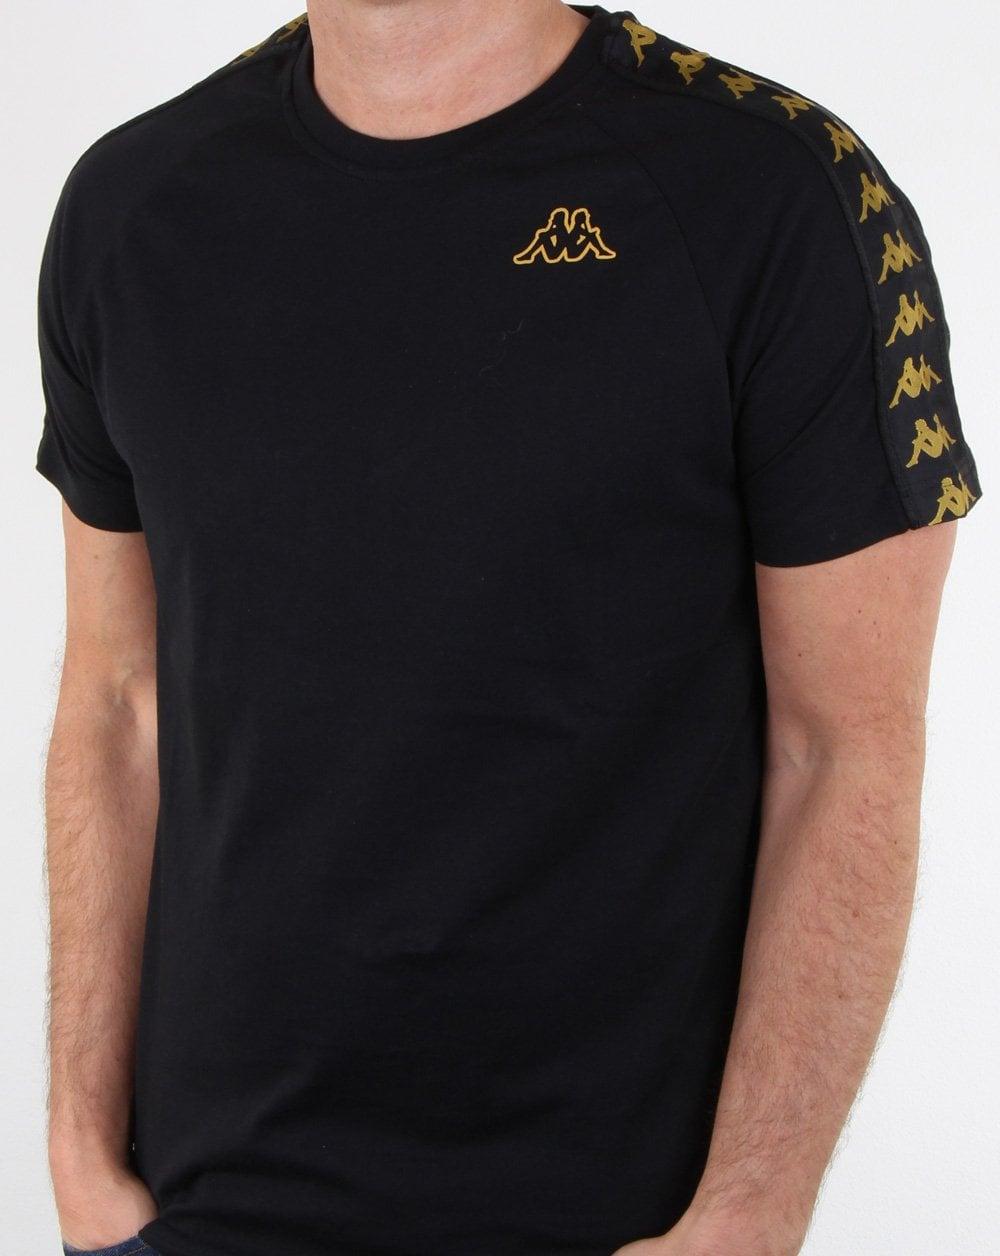 c89c1601 Kappa, Banda Coen T-shirt, Black/gold   80s casual classics